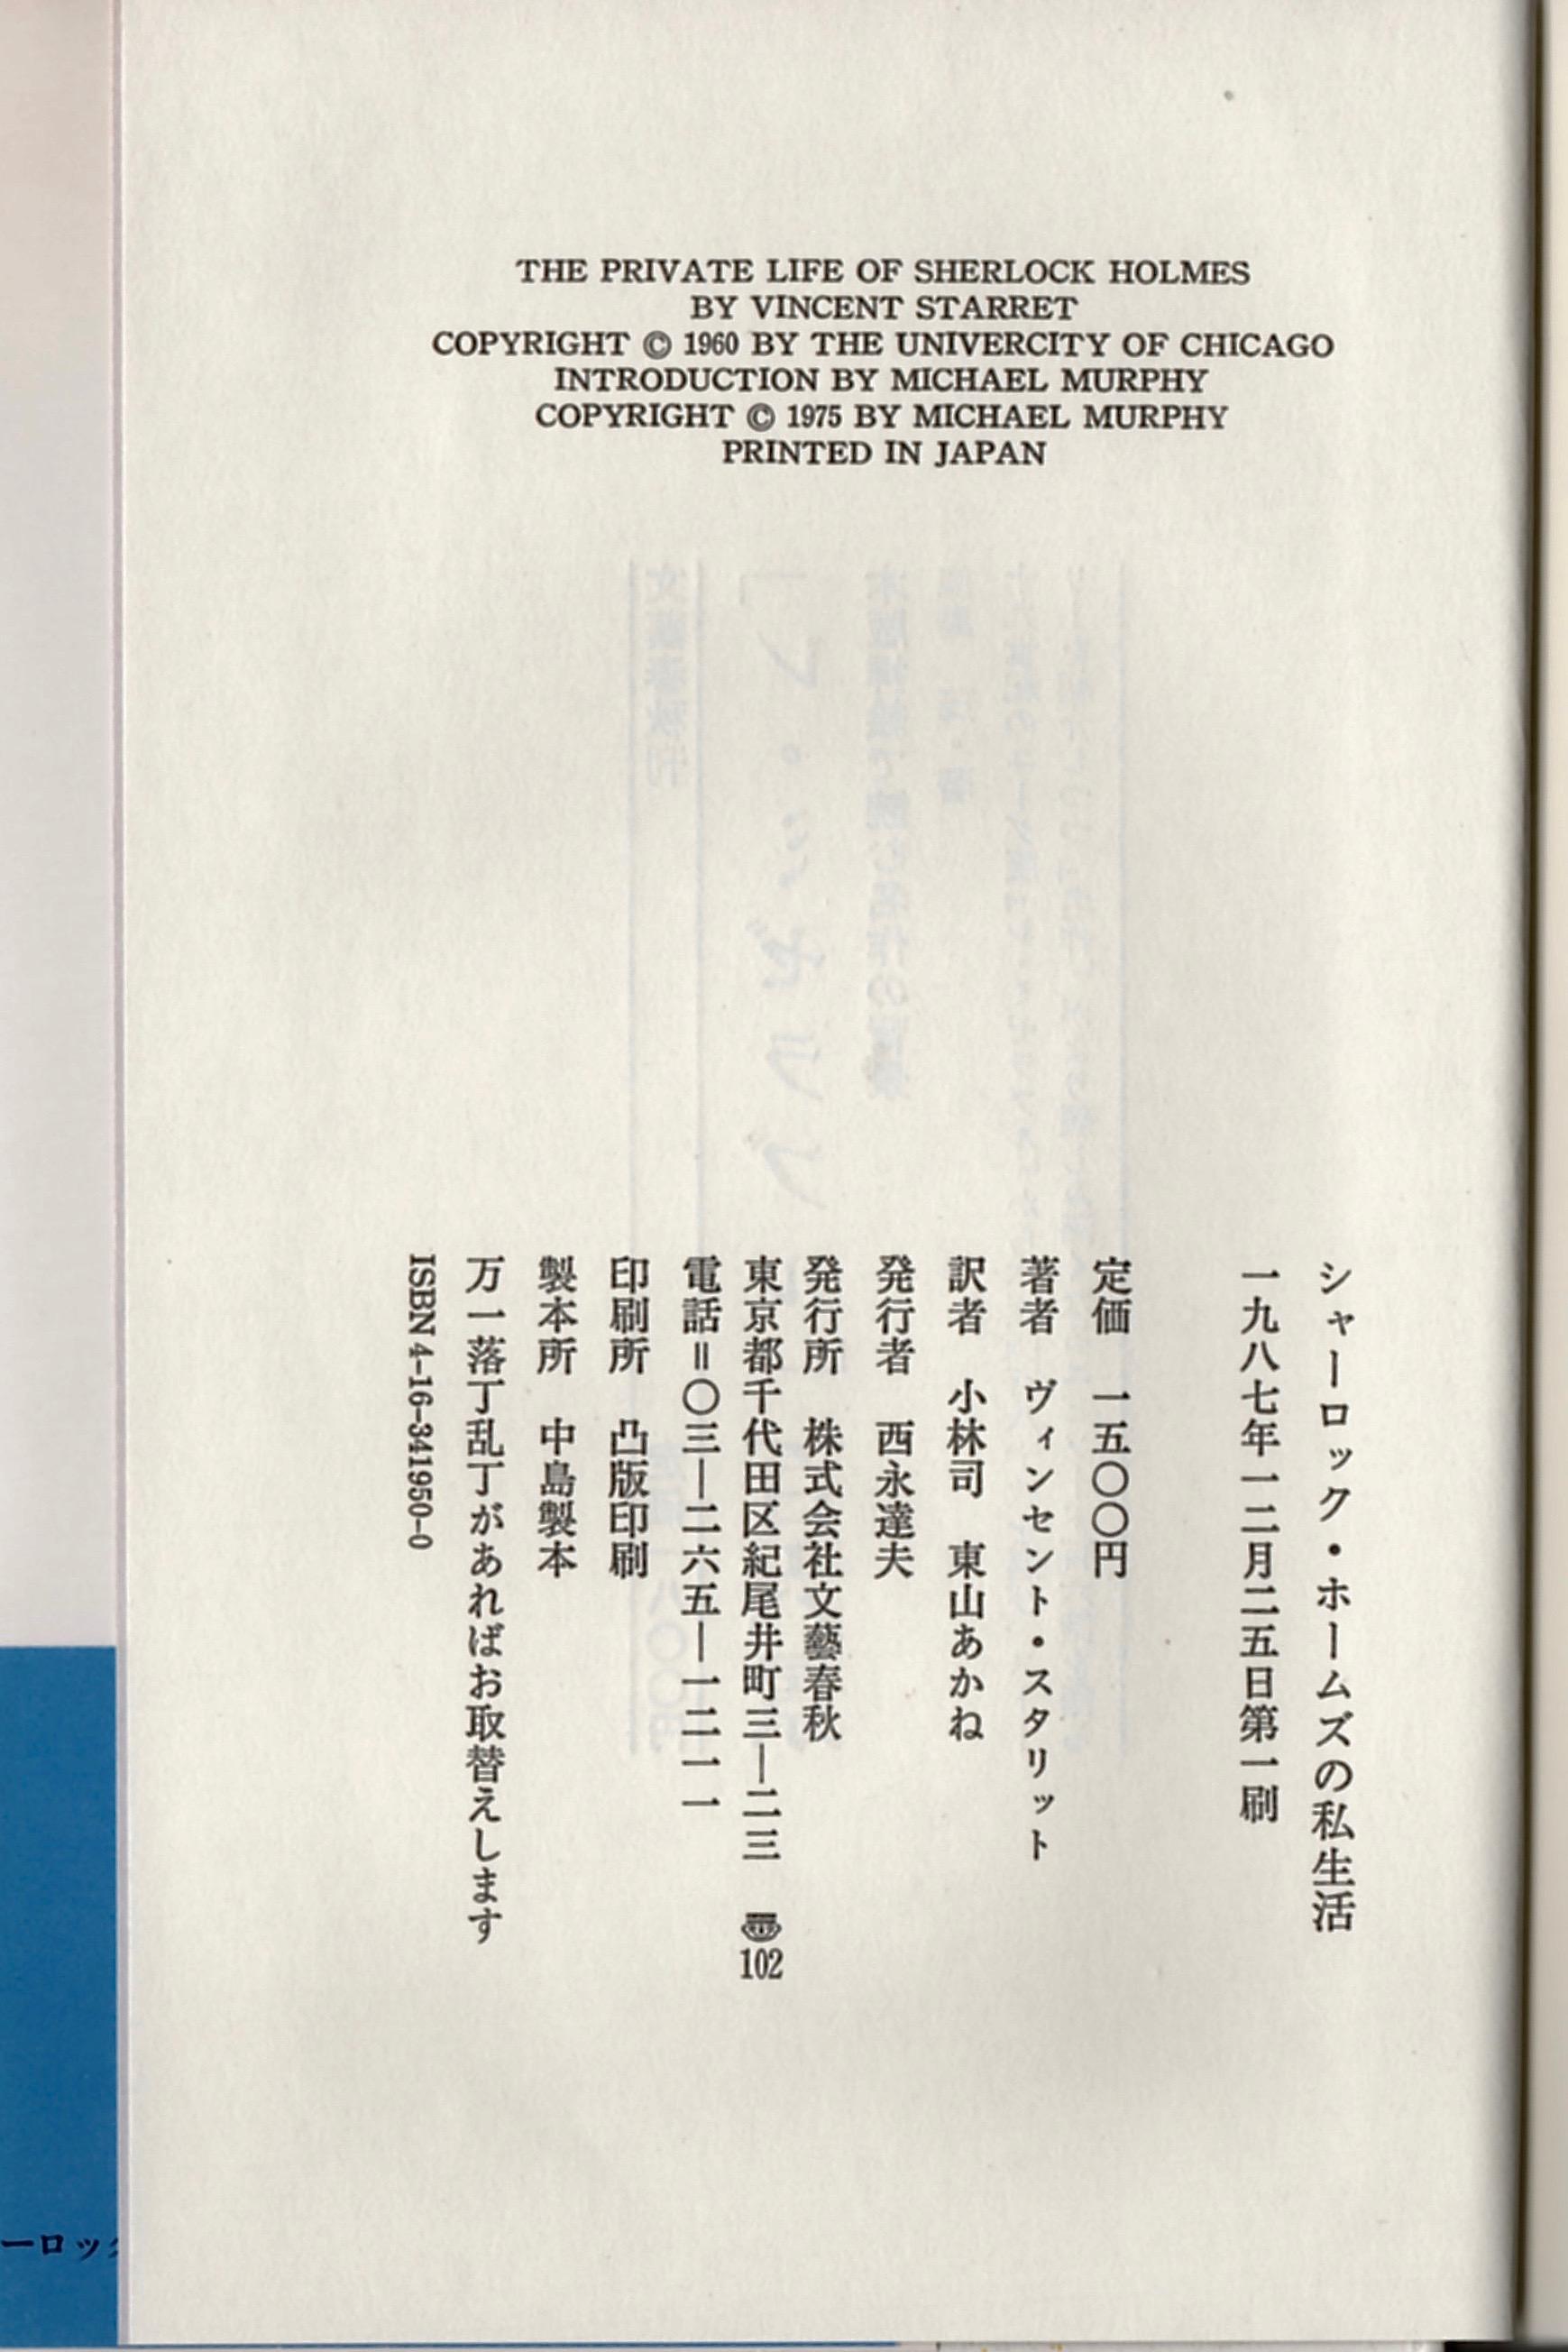 TPLOSH Japan hardback title.jpeg